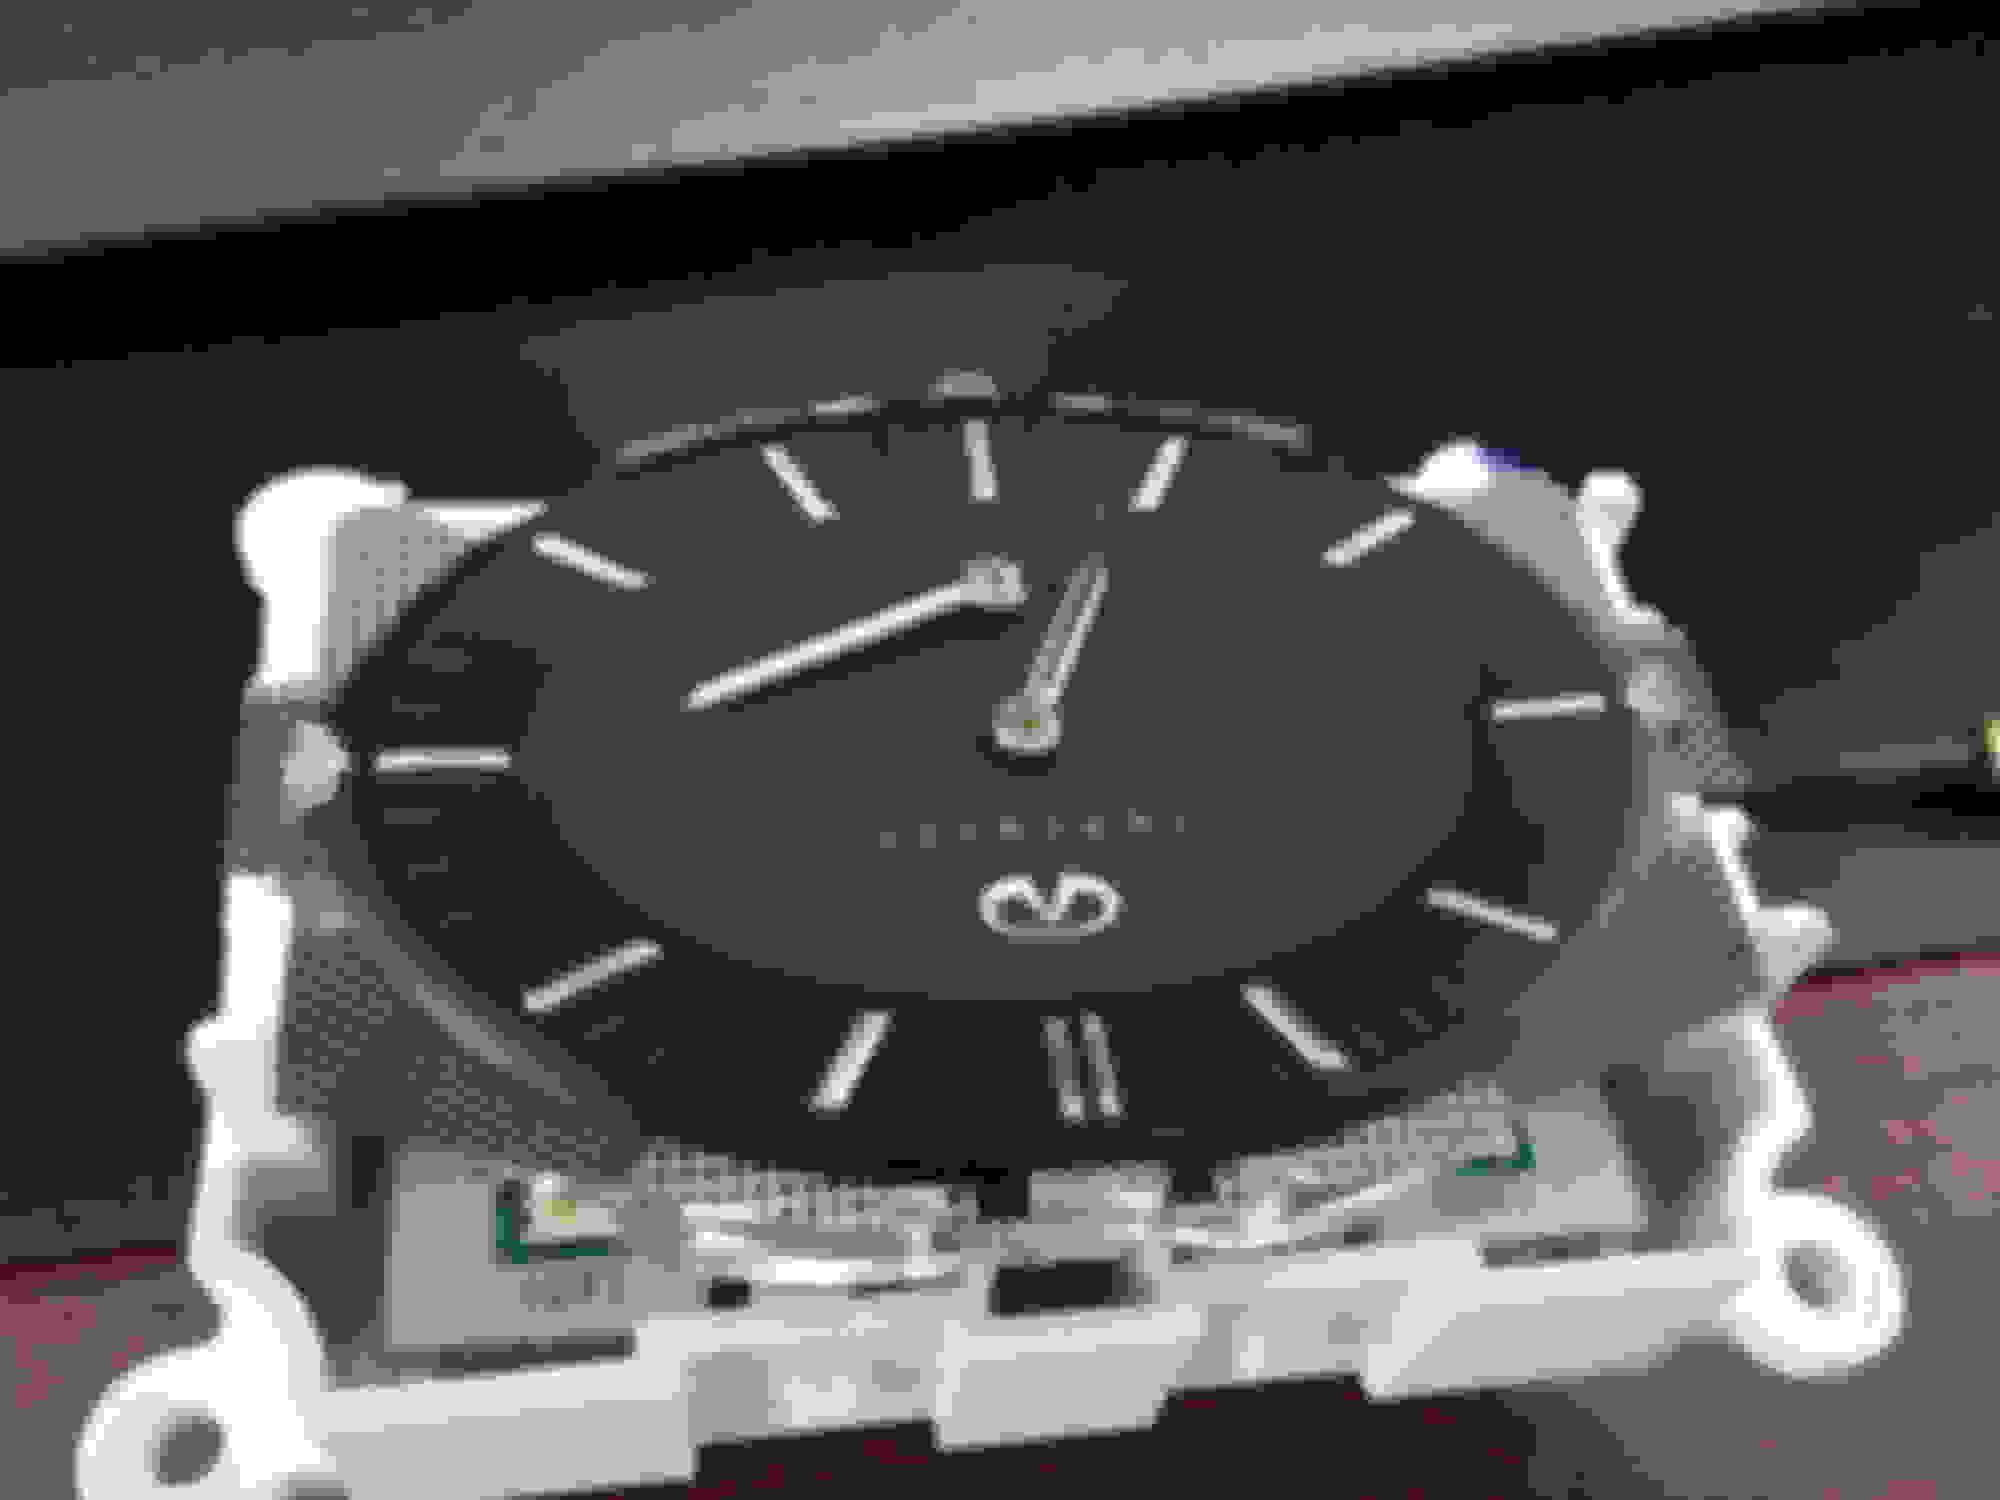 Analog Clock Lights Flickering - Repaired! - MyG37